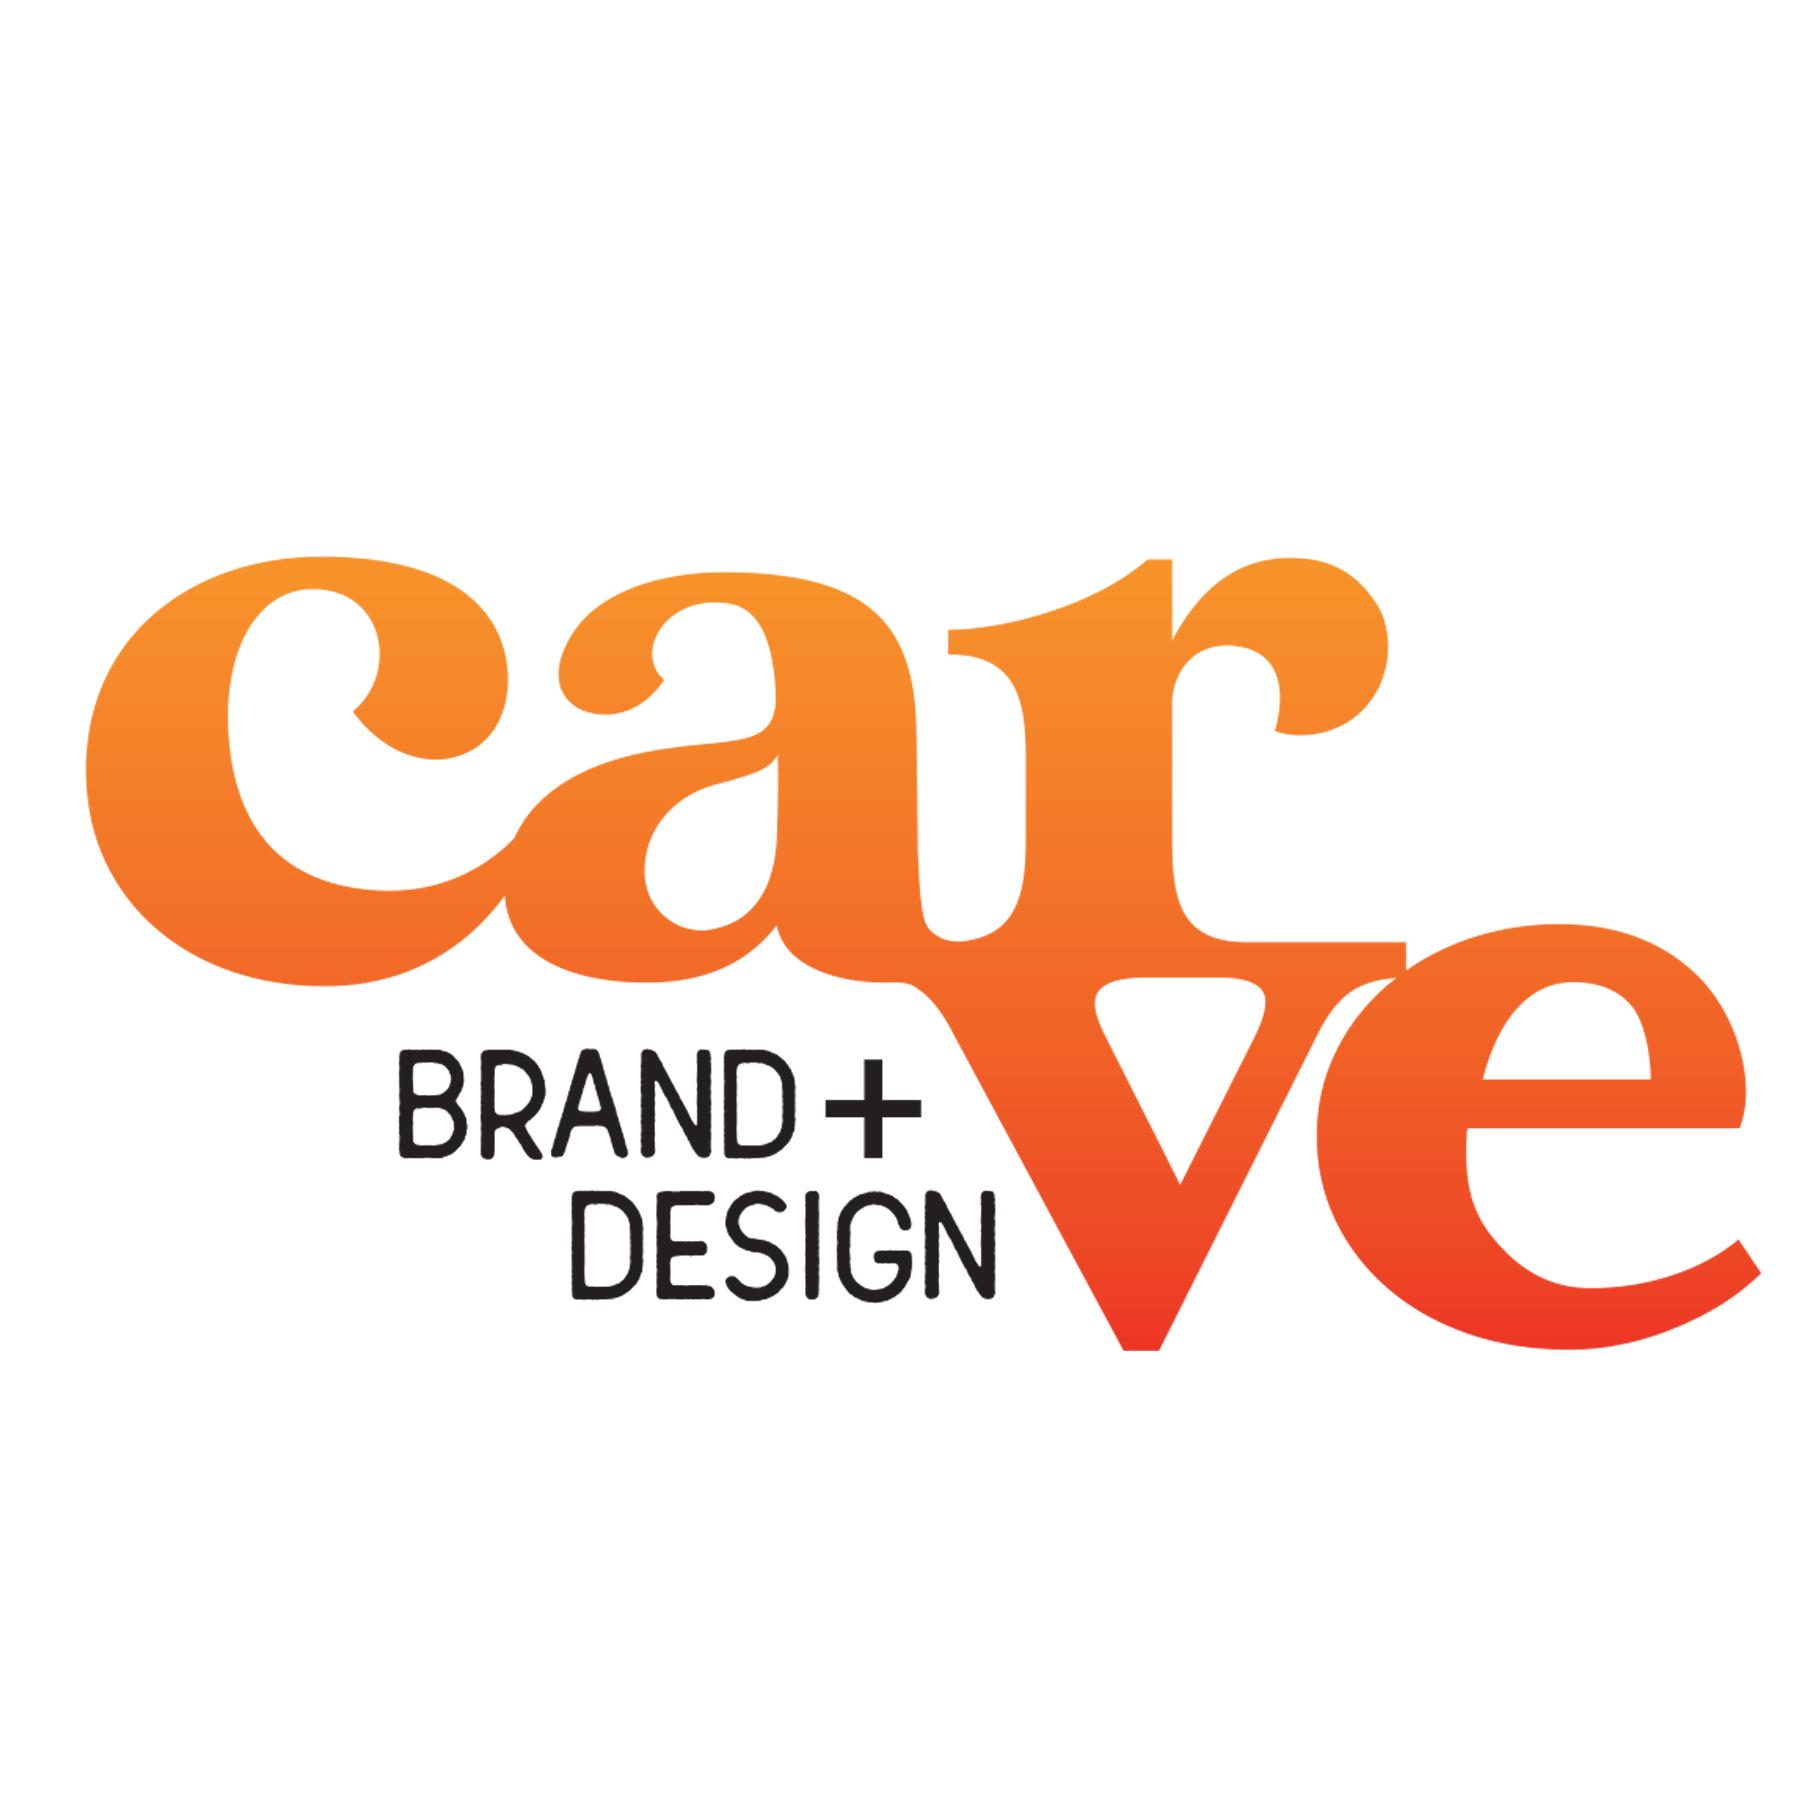 Carve on LogoLounge